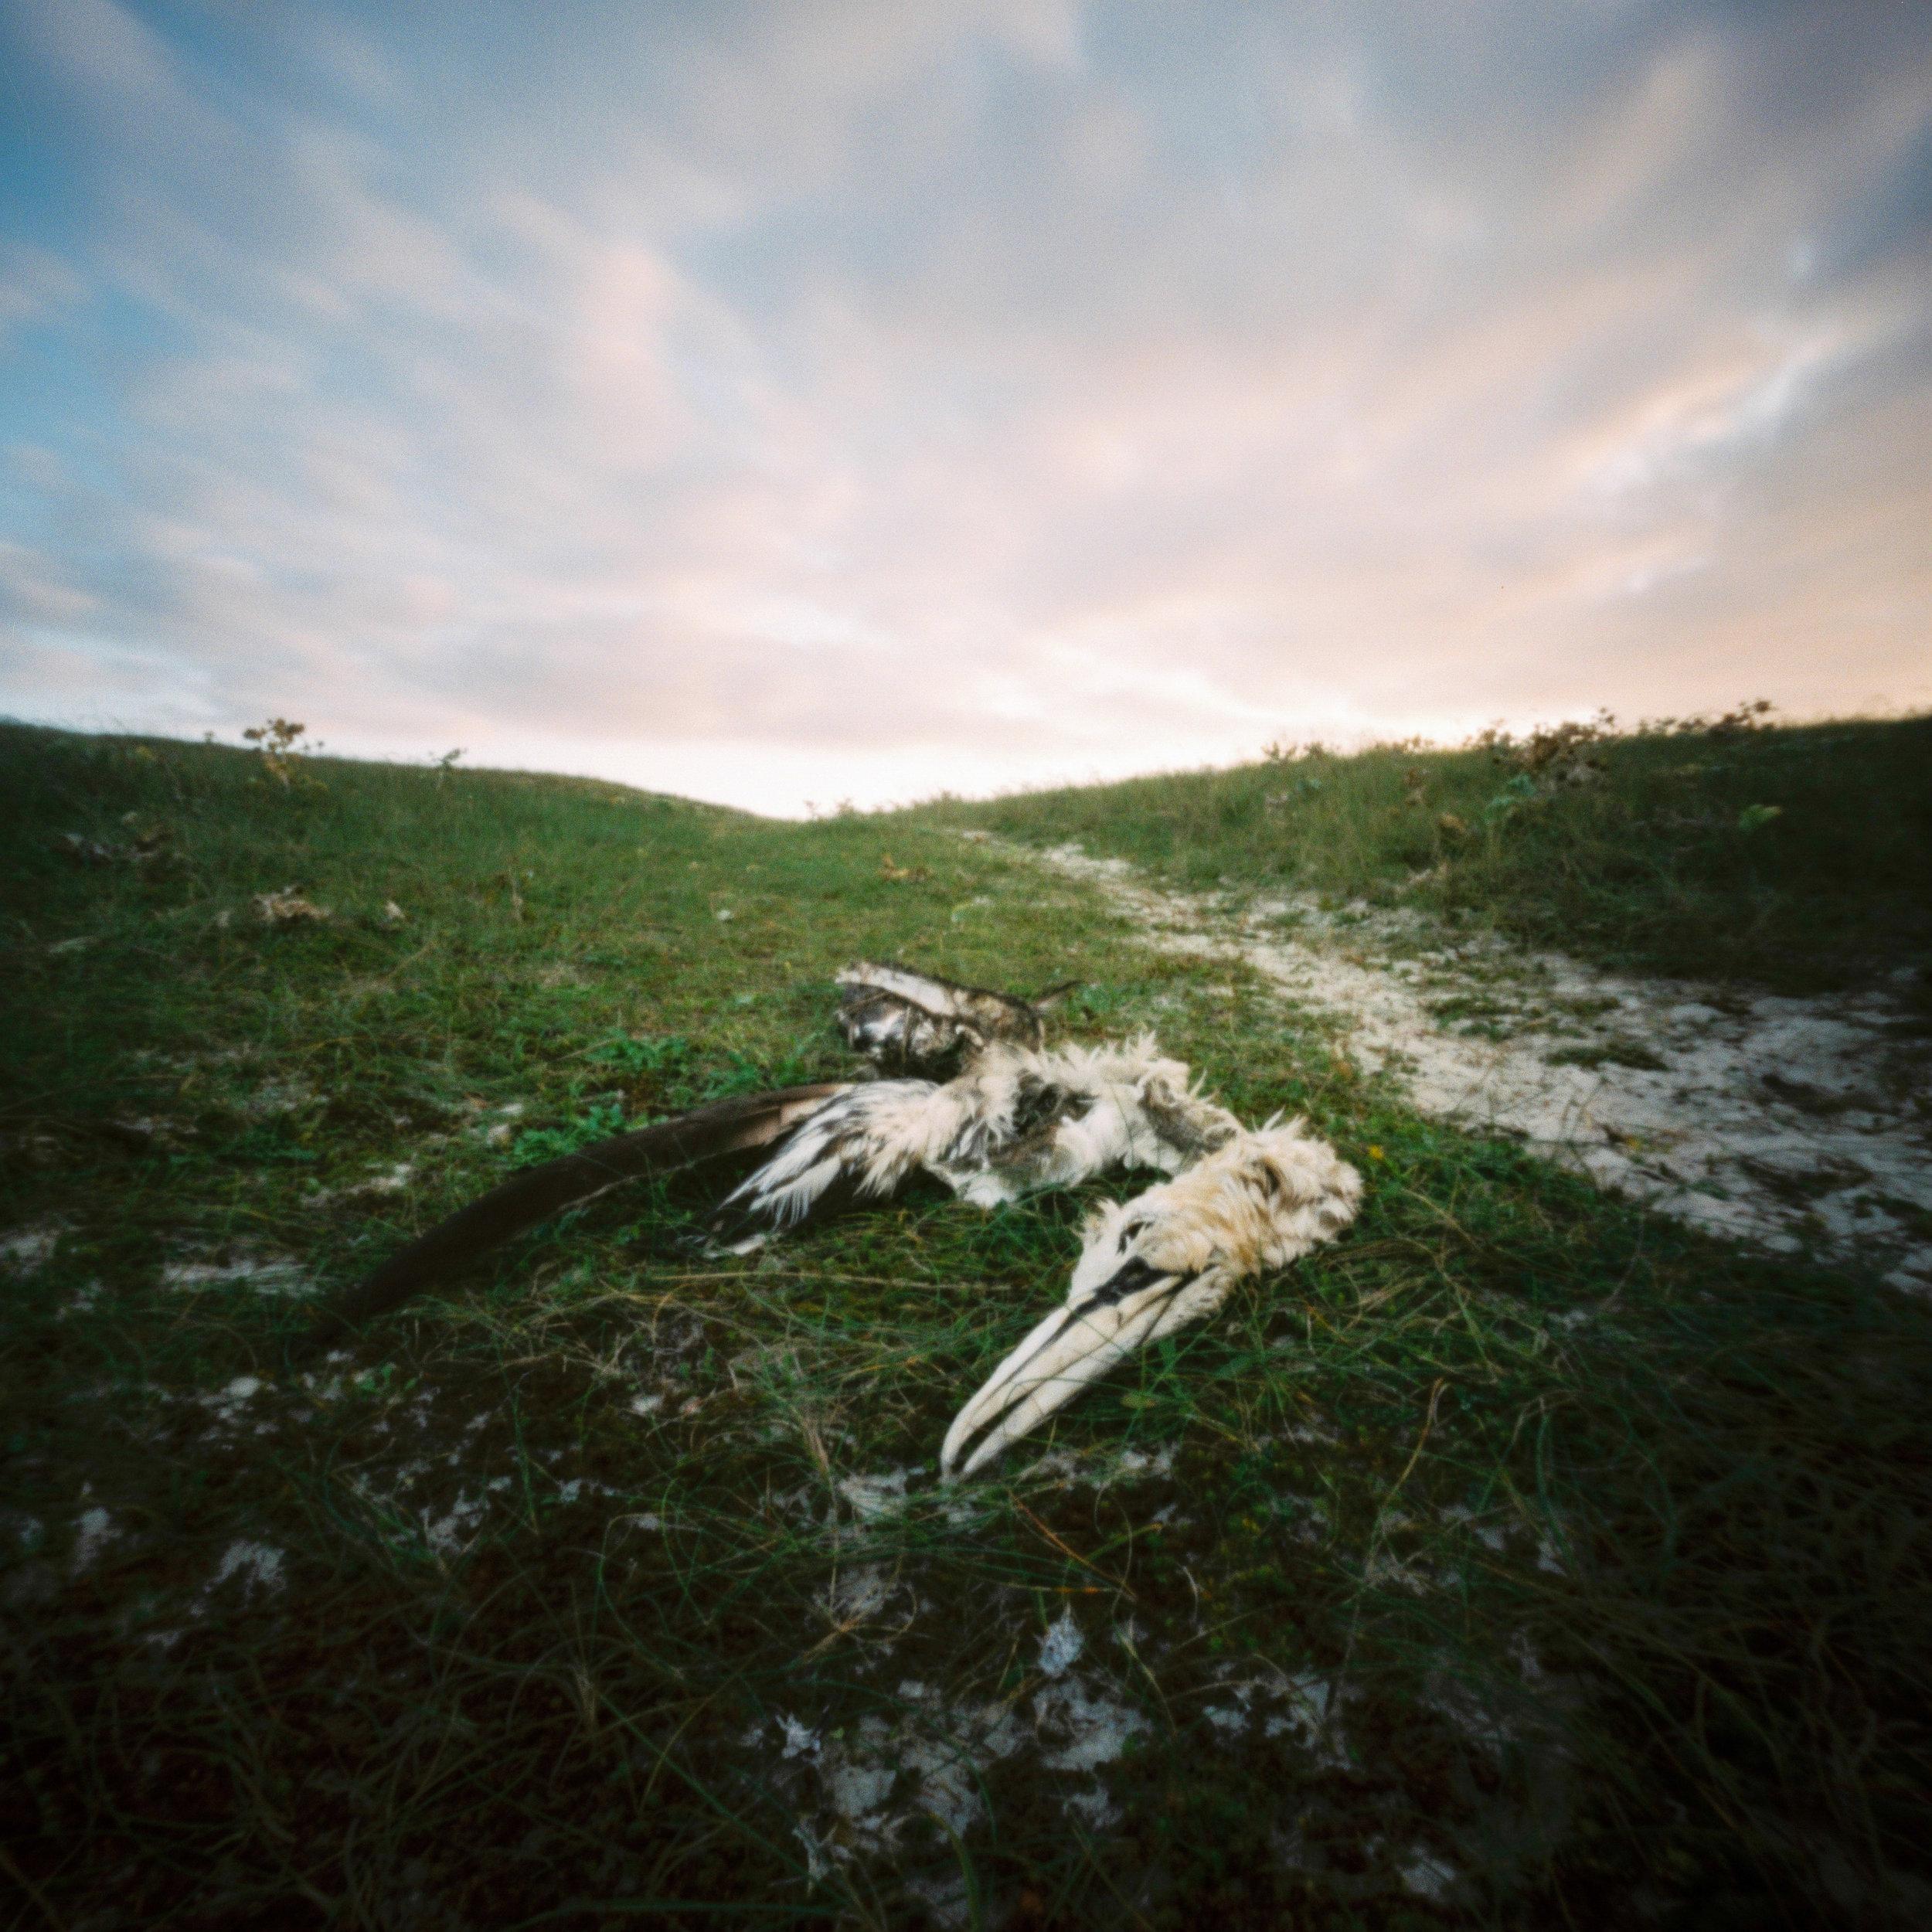 Nils Karlson | meet me when the suns stand still | Zero Image | Fuji 400h